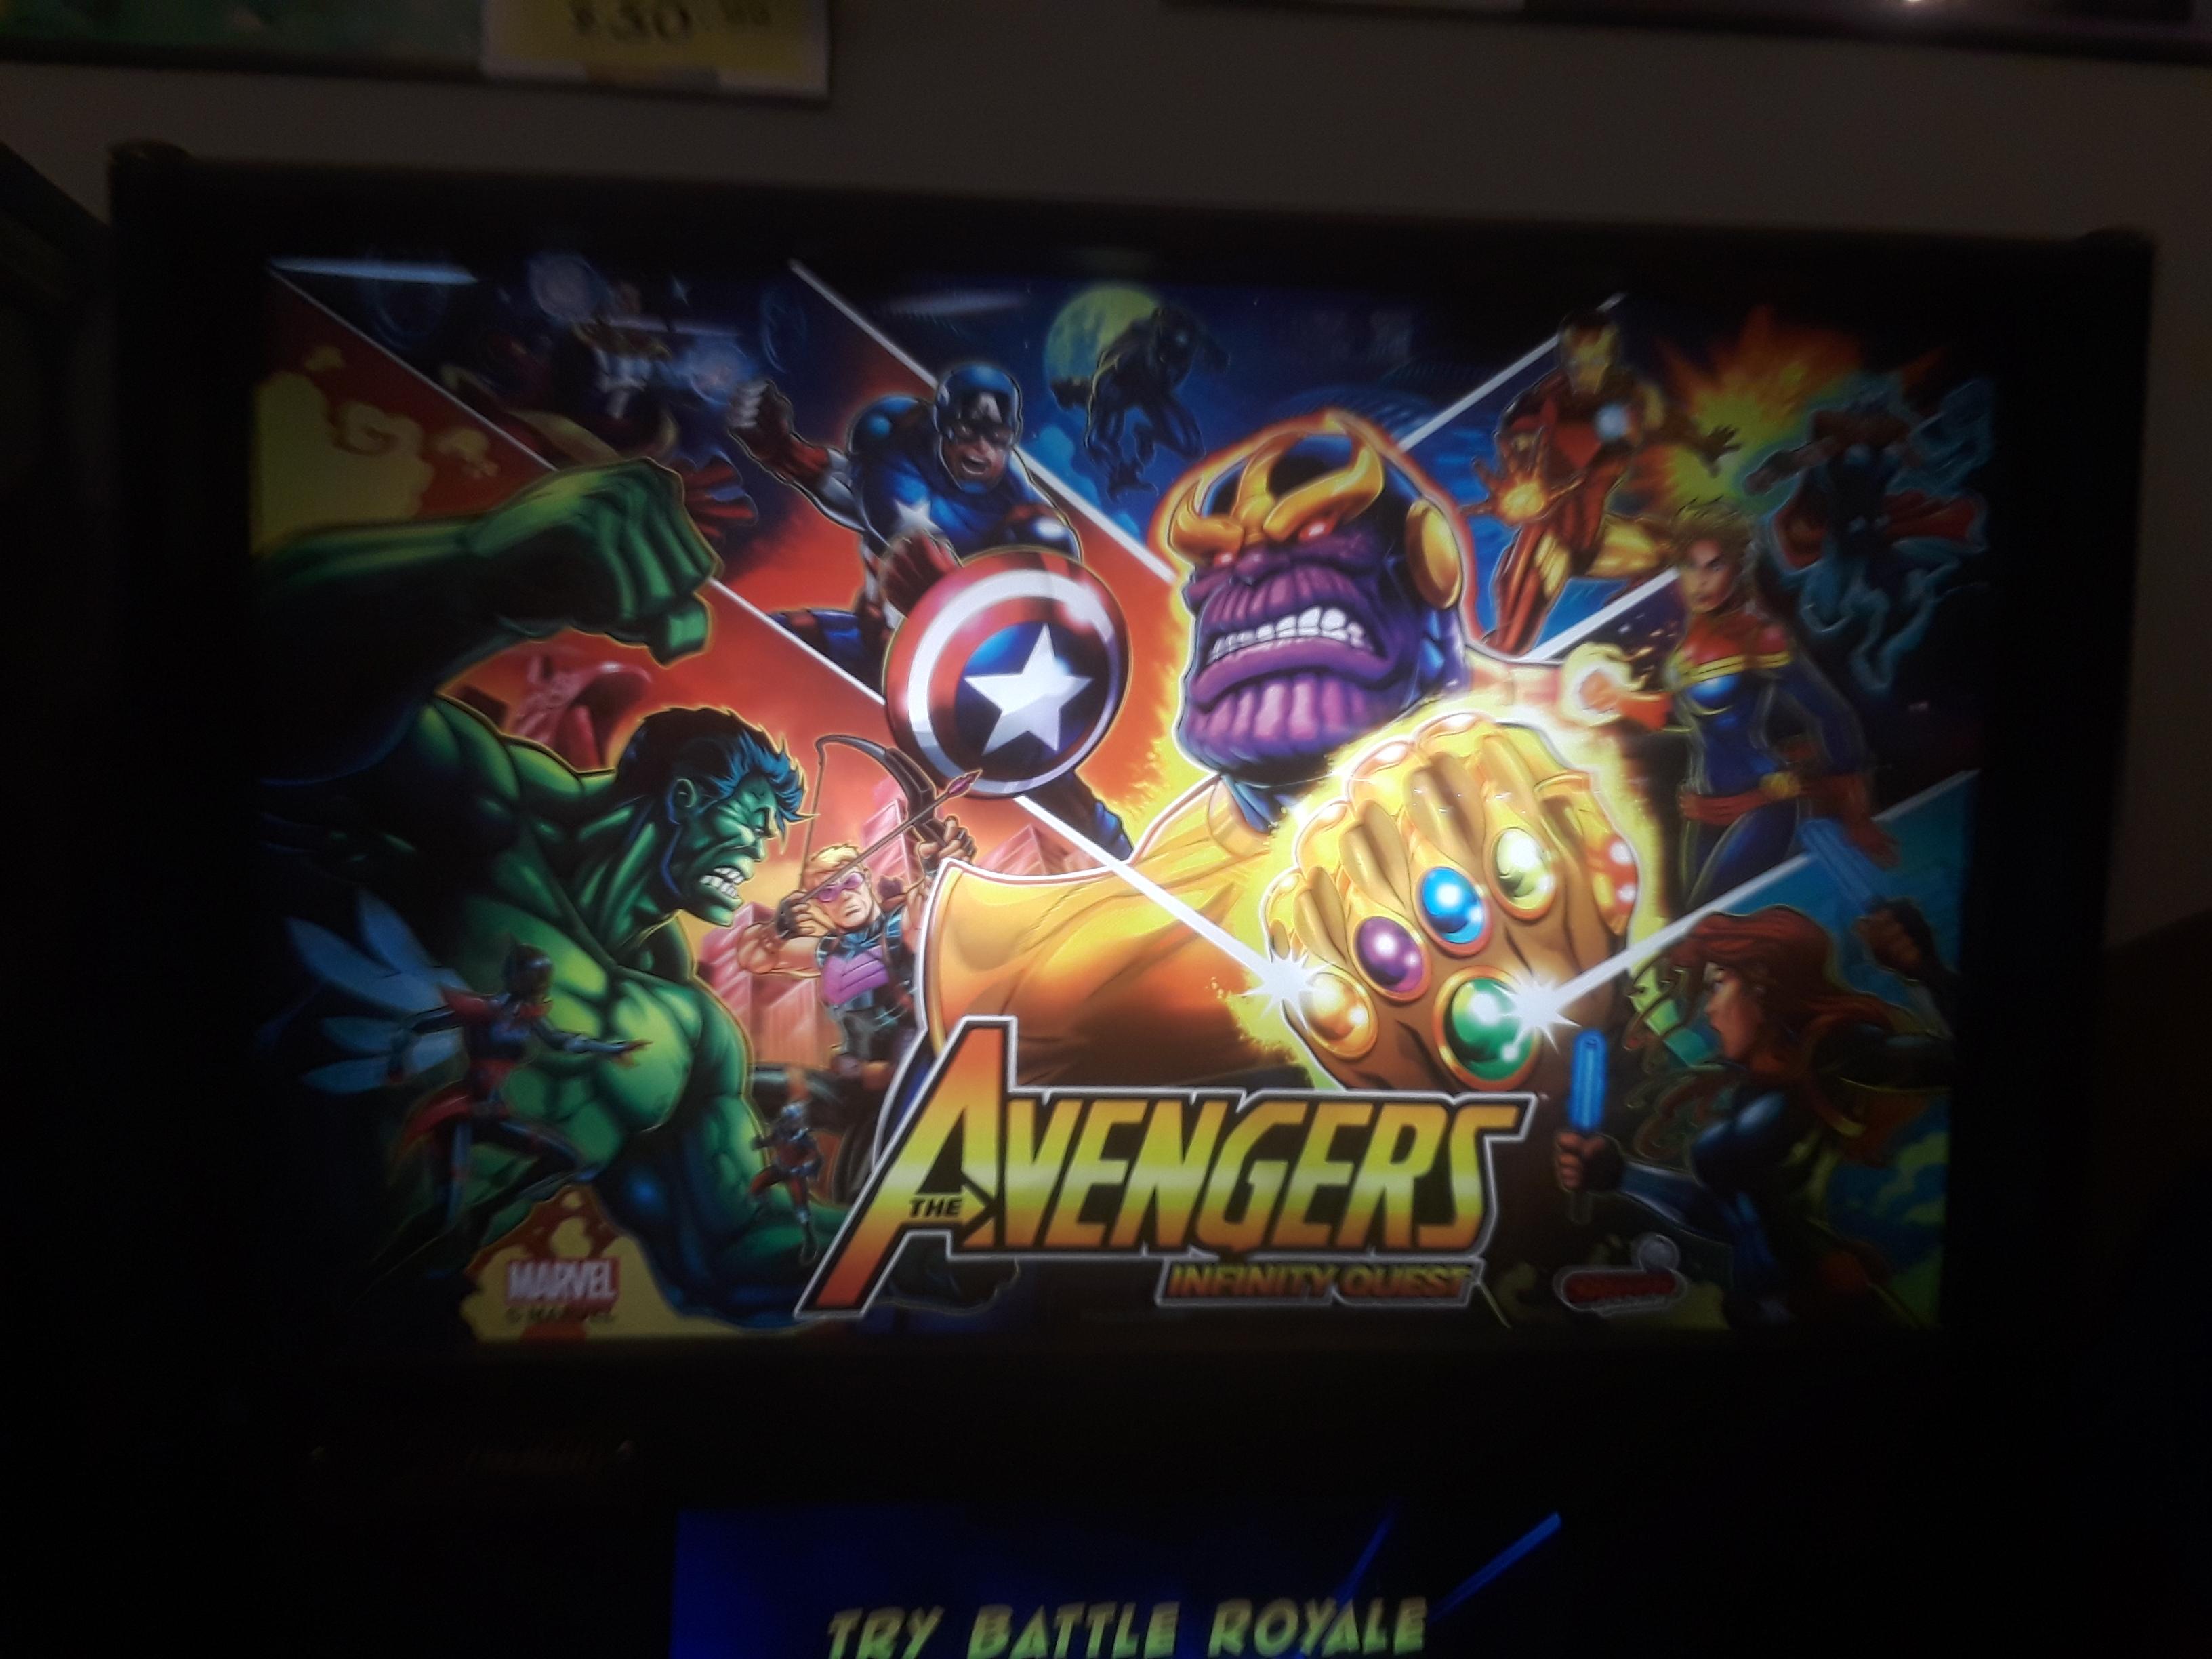 JML101582: The Avengers [Pro] (Pinball: 3 Balls) 19,956,640 points on 2021-03-26 16:47:56